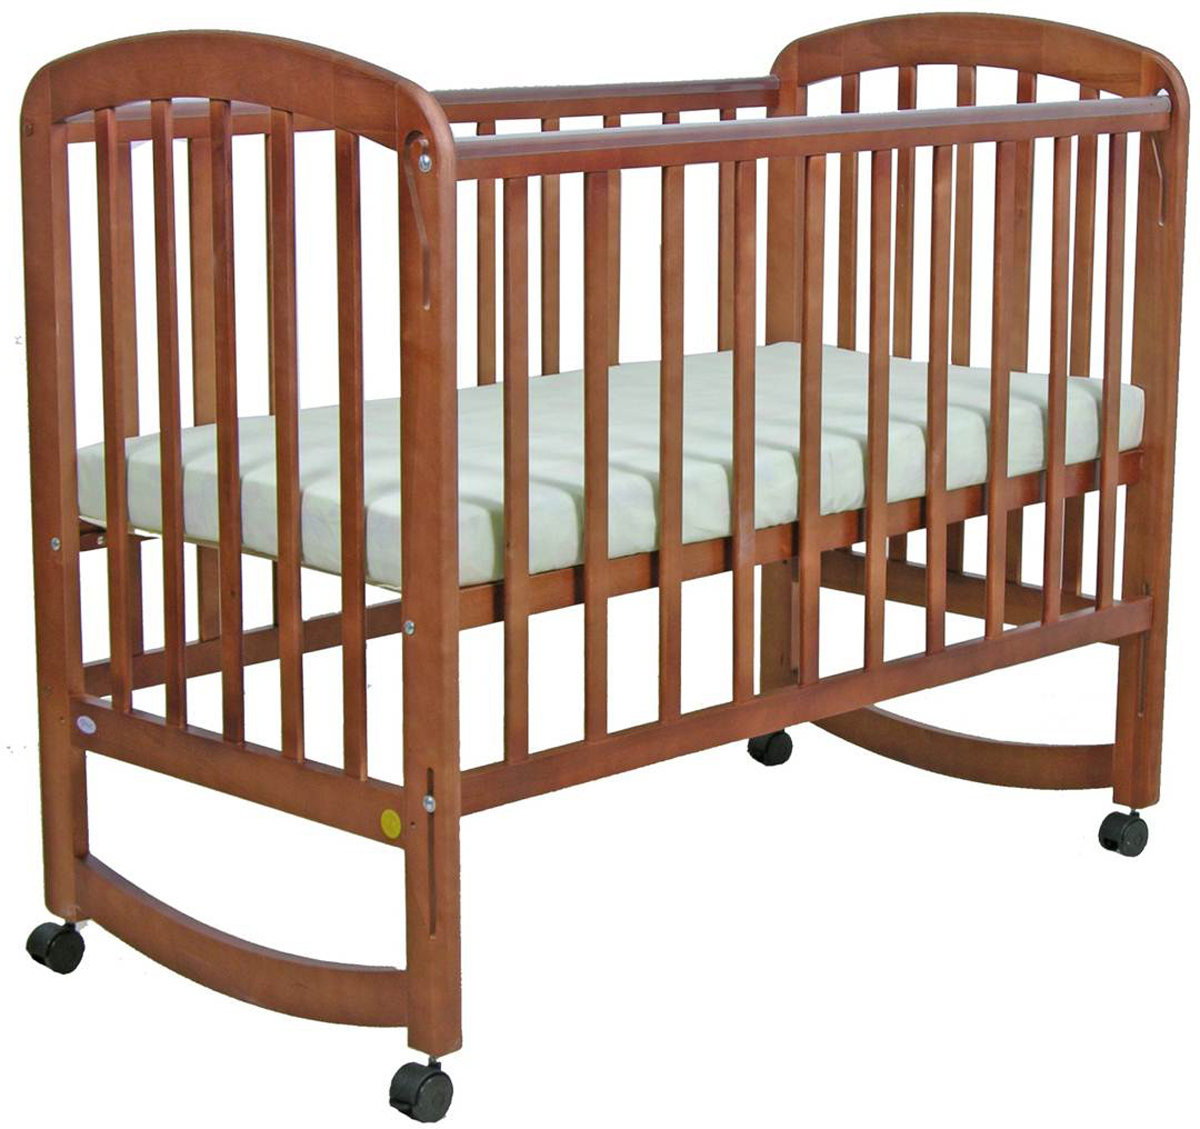 Фея Кровать детская цвет орех 0005514-02 ваза mughal l 20 х 20 х 30 см